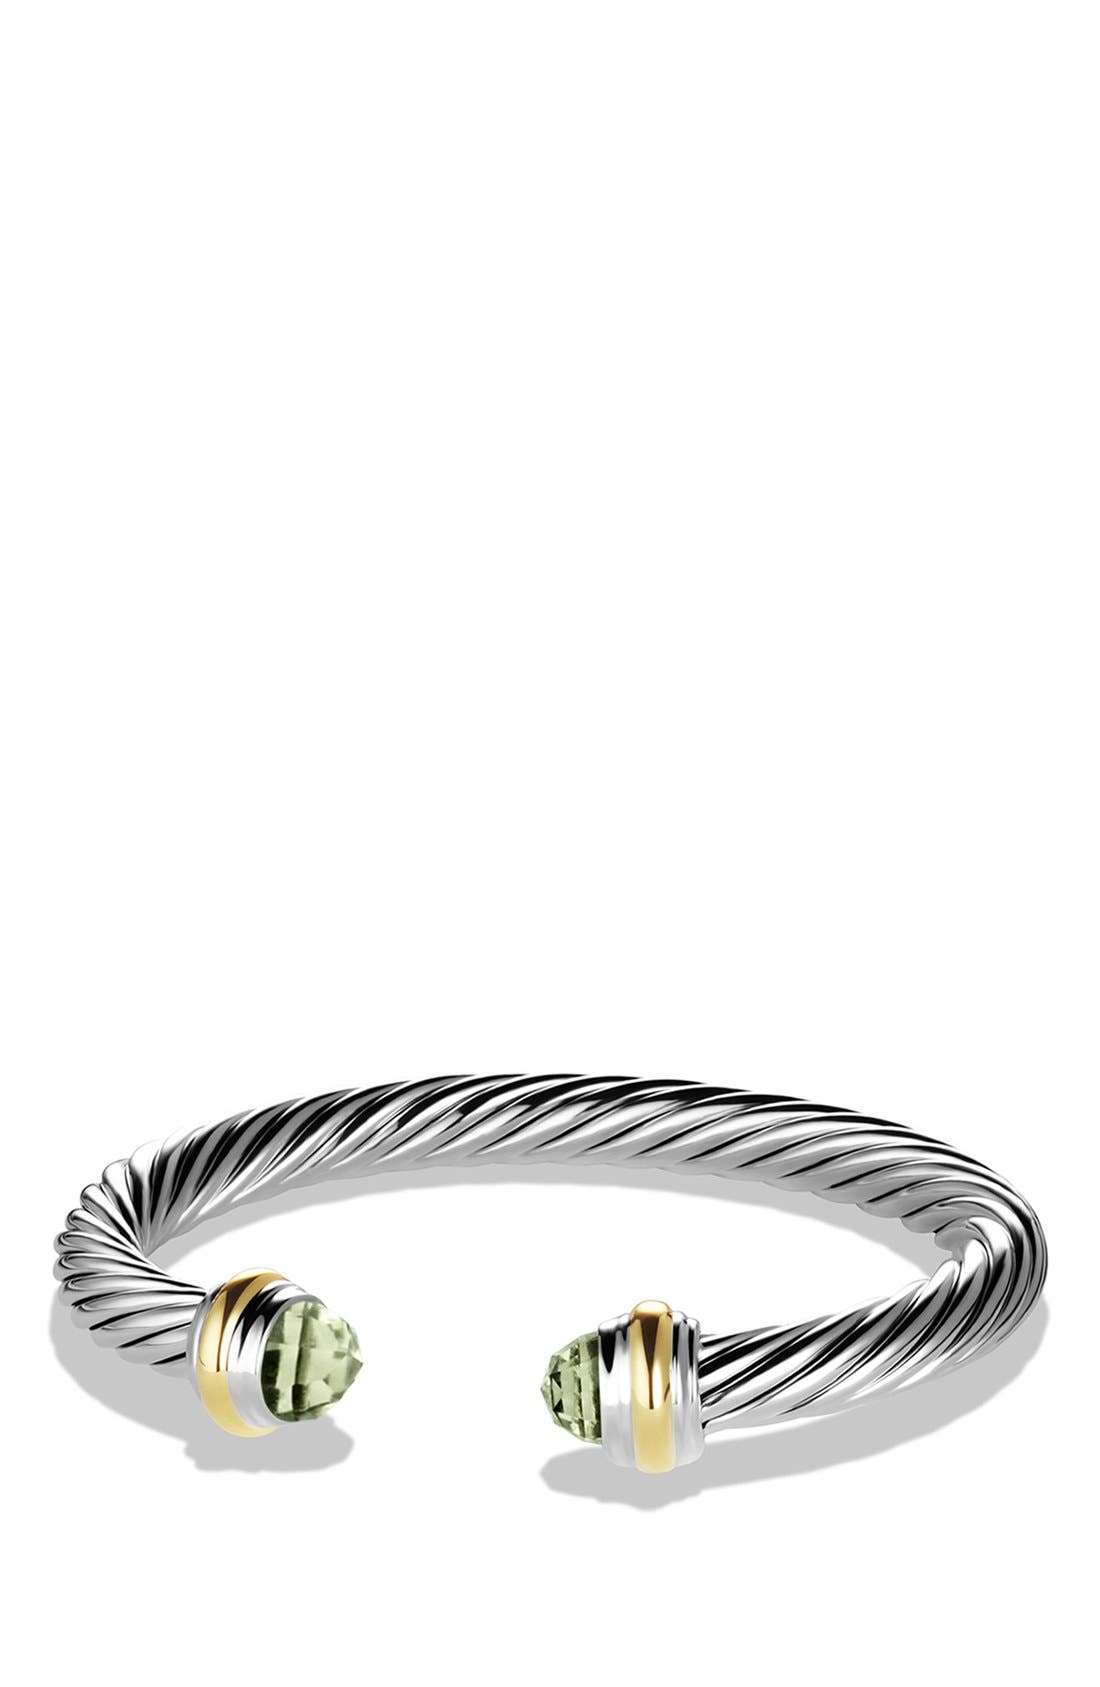 DAVID YURMAN Cable Classics Bracelet with Semiprecious Stones & 14K Gold, 7mm, Main, color, PRASIOLITE